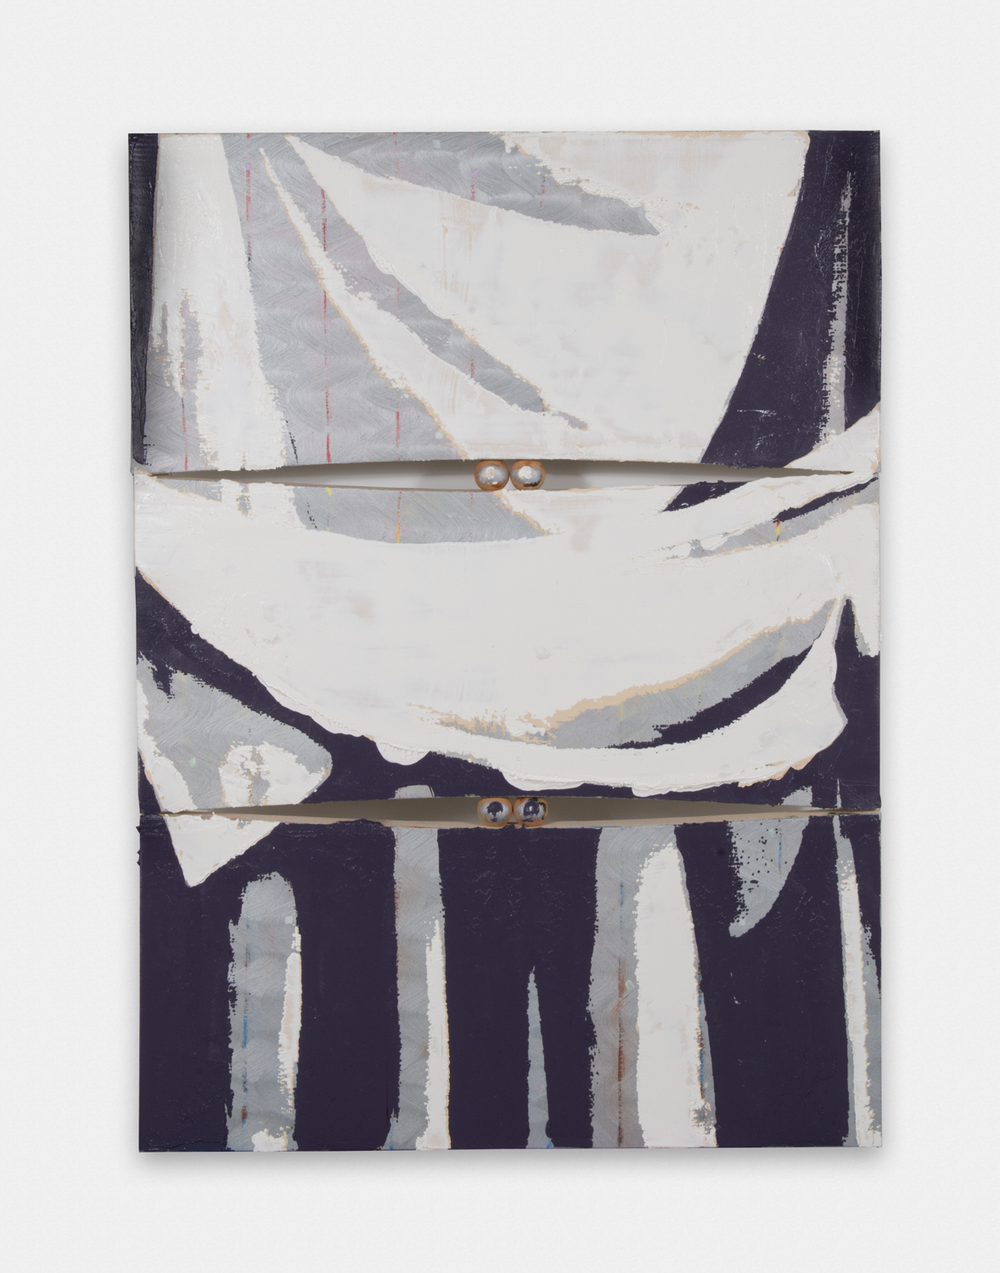 Matthew Girson  Dance With Veils  2016 Oil on canvas 61h x 45w in MGir001